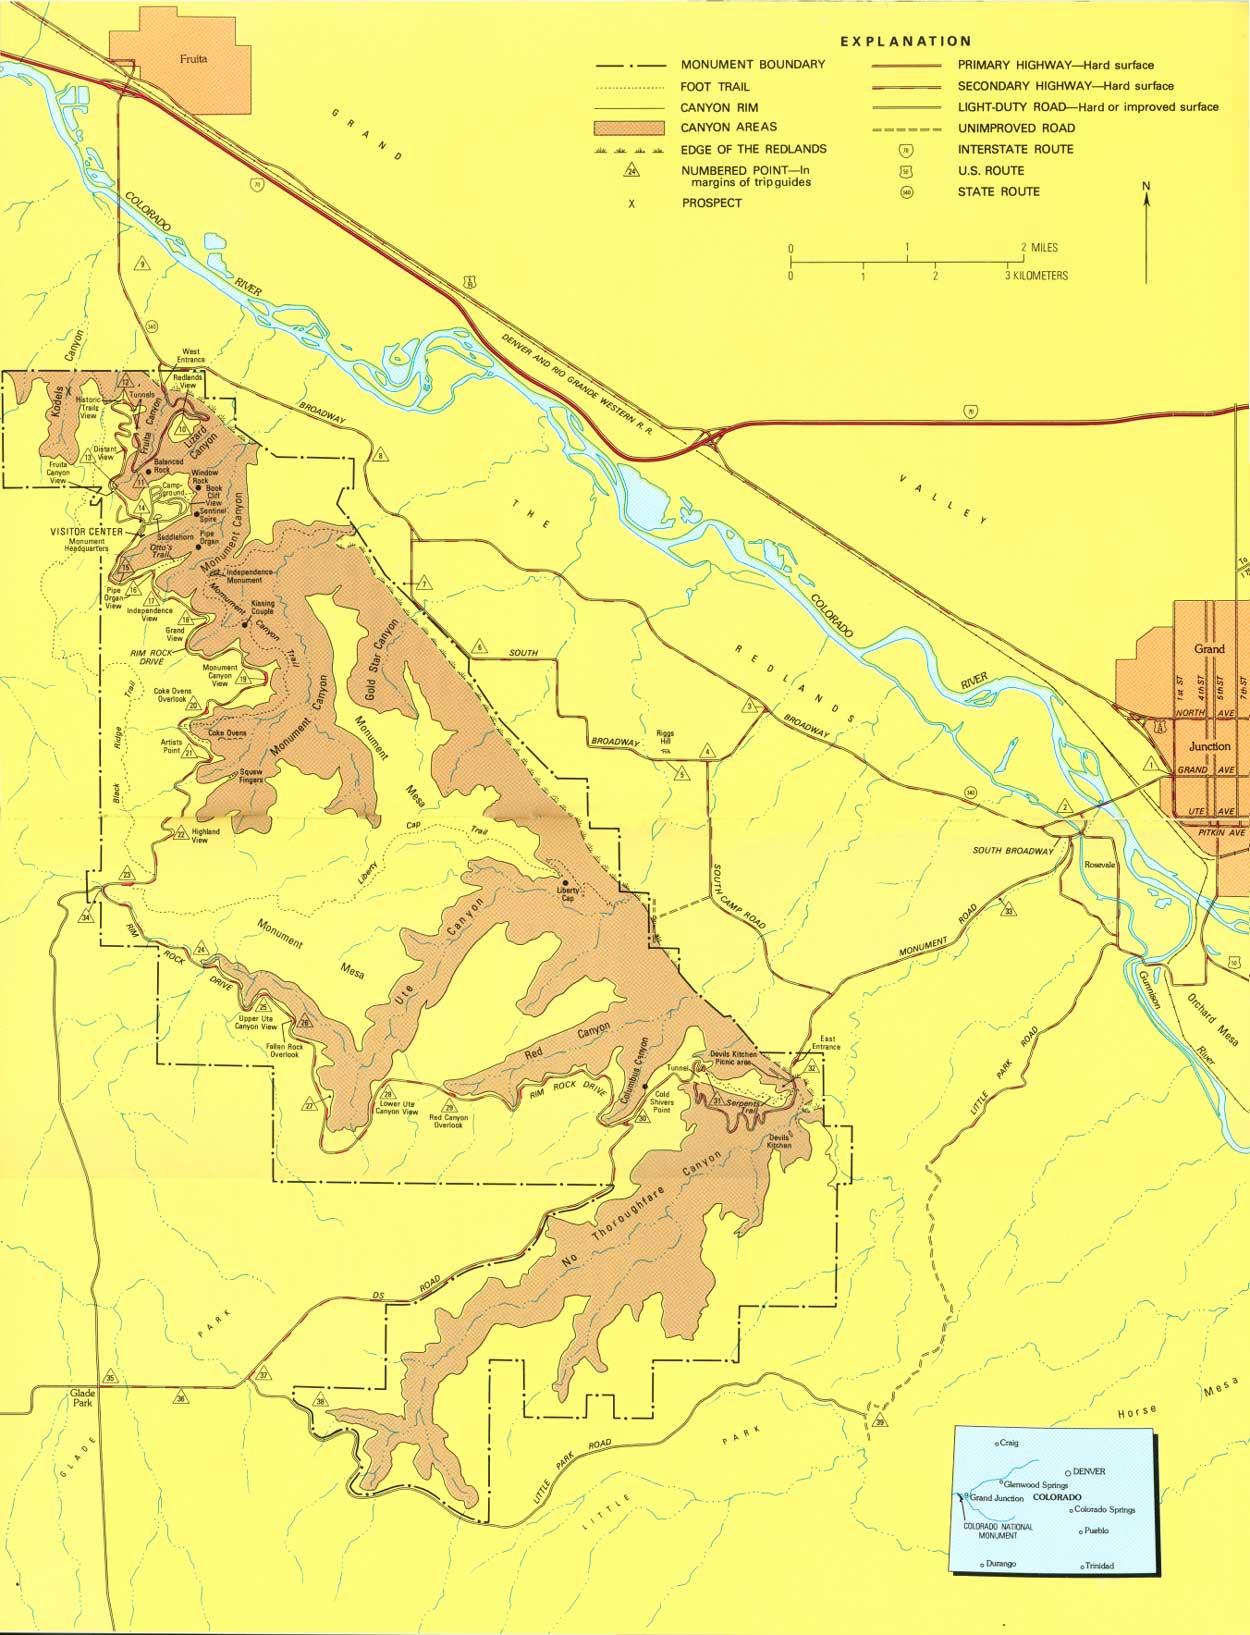 Colorado National Monument Map - Grand Juction Colorado USA ...